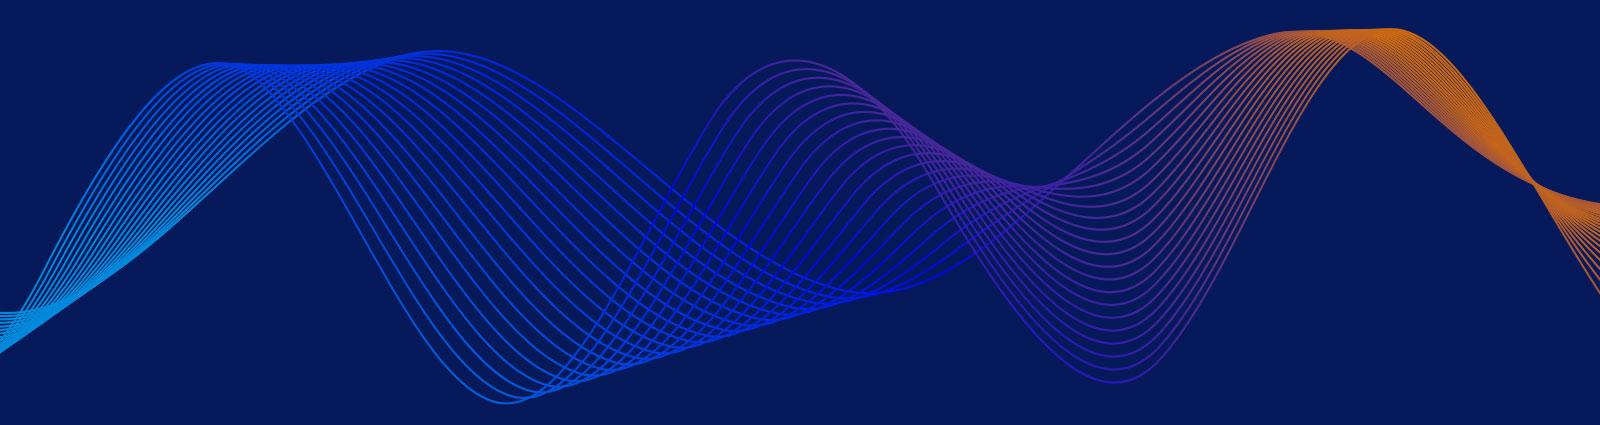 NYIIX-Centillion-II-Wavy-Lines-Graphic